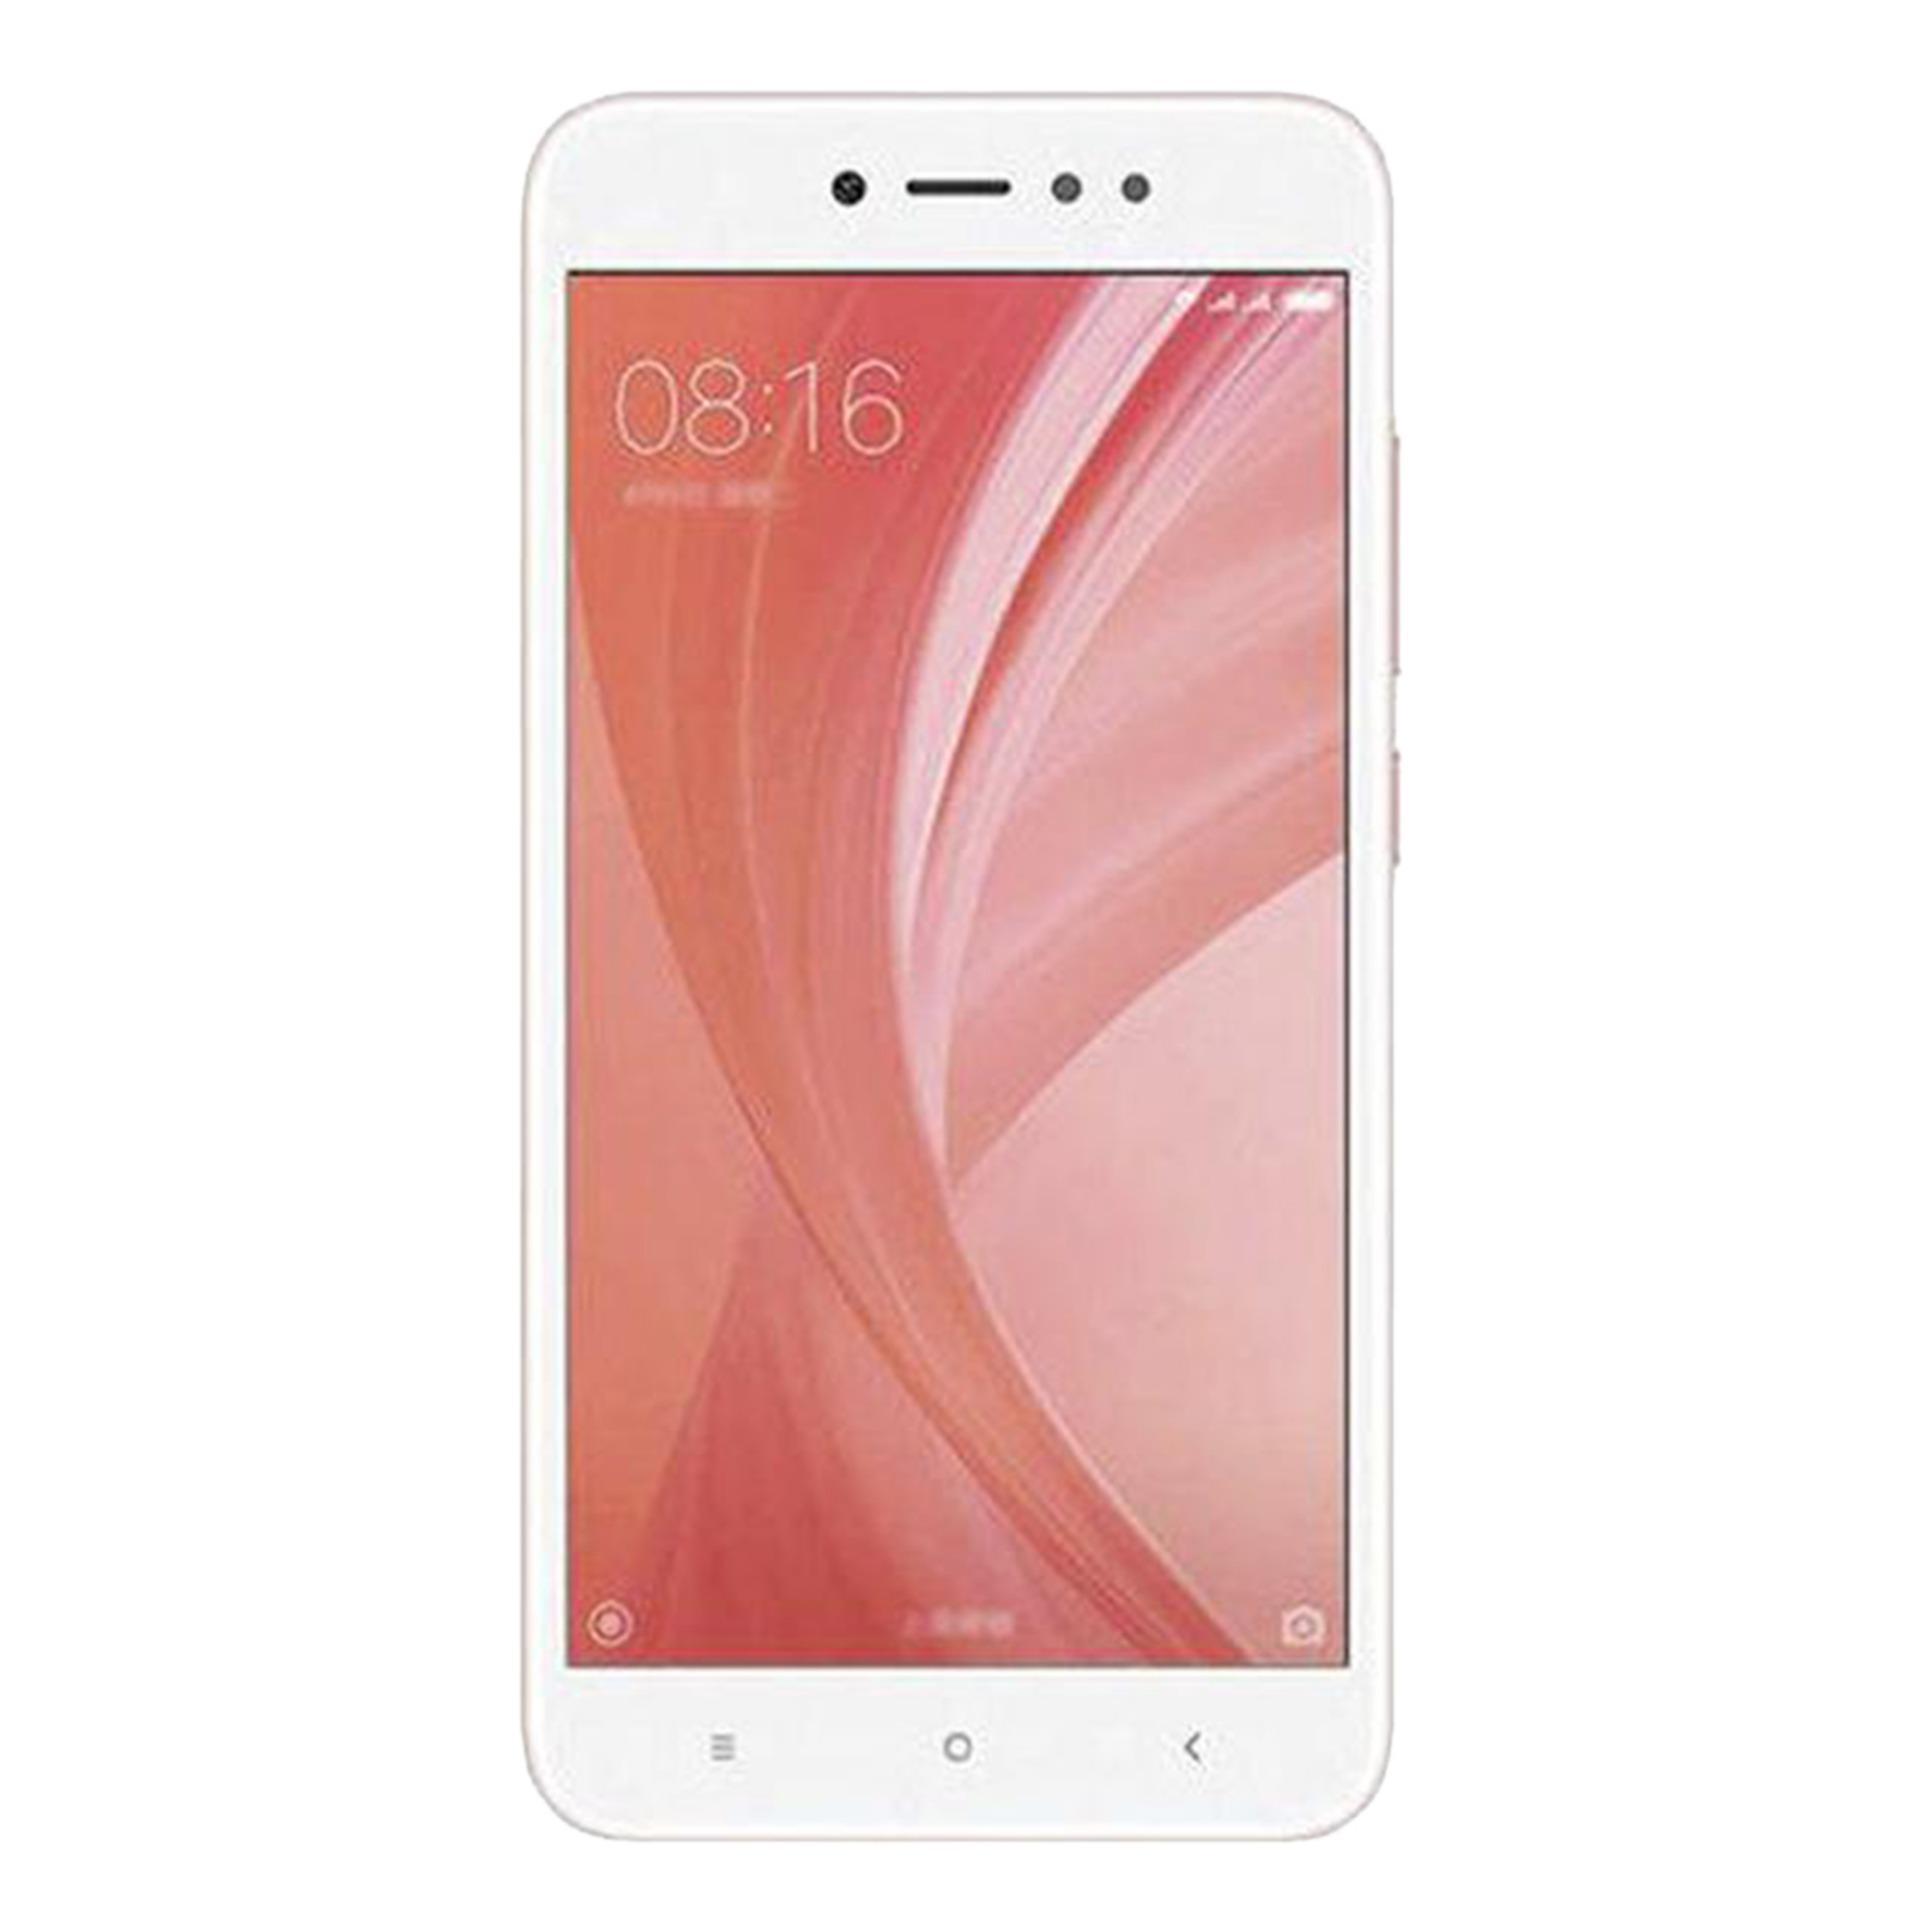 Xiaomi Mobile Phone In Bangladesh At Best Price Redmi Note 4x Gold 4 64gb 5a Prime Smartphone 55 3gb Ram 32gb Rom